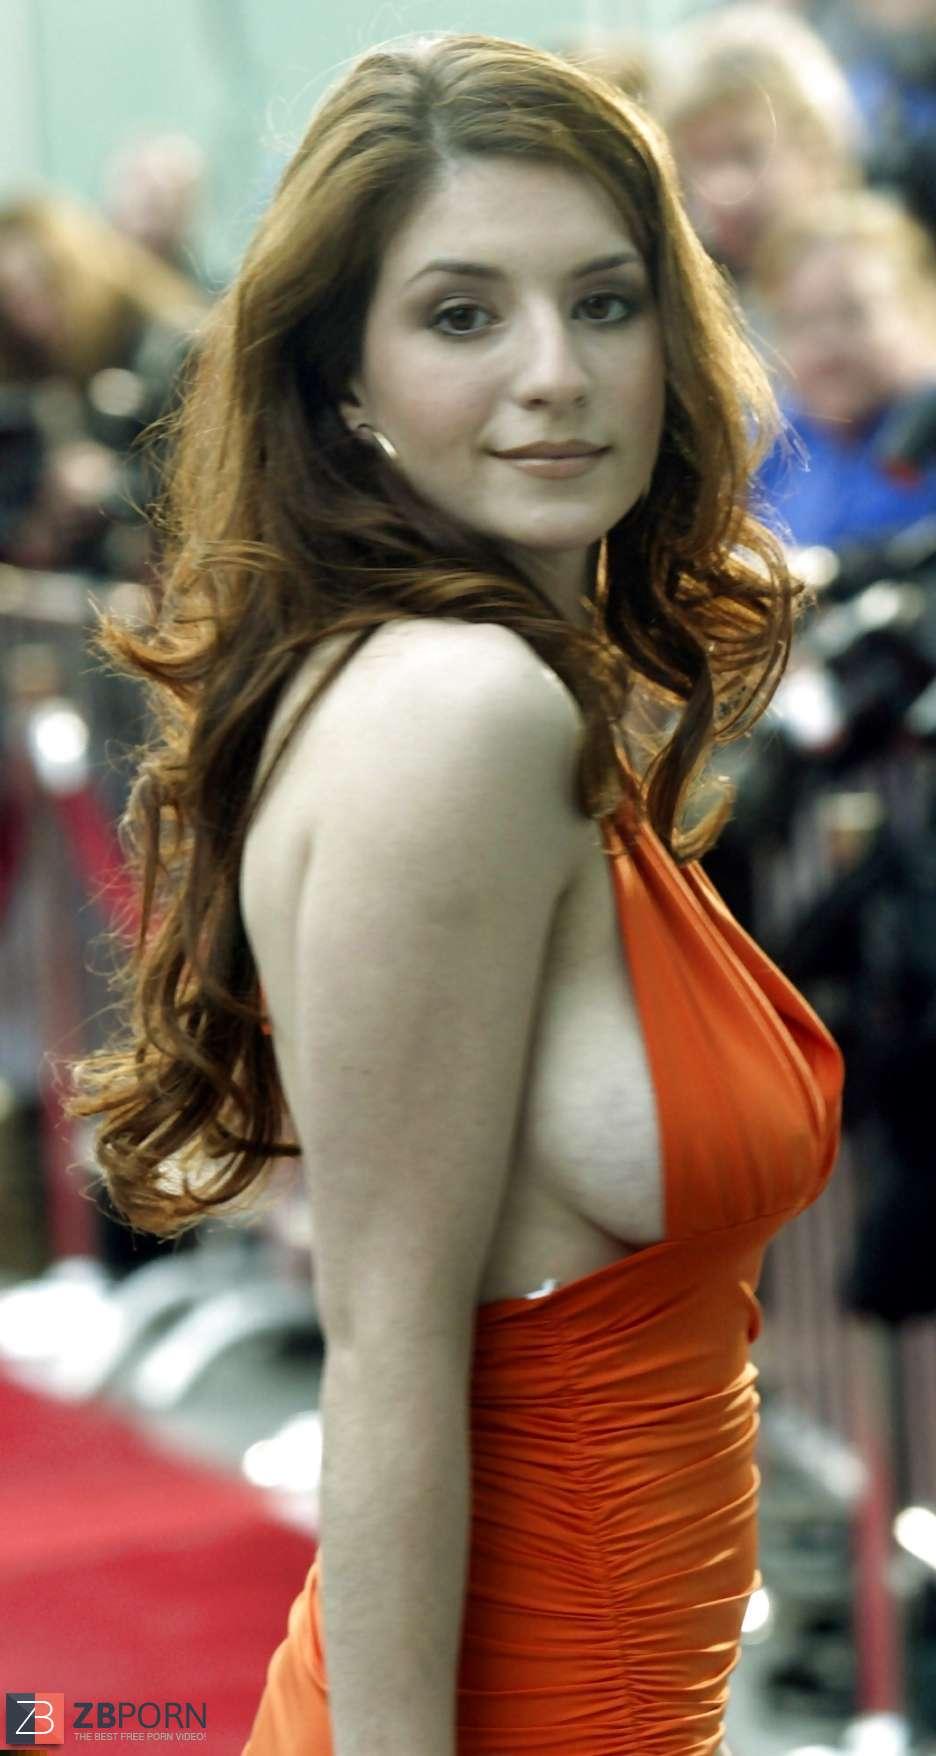 Versace reccomend Anneliese van der pol bikini pictures